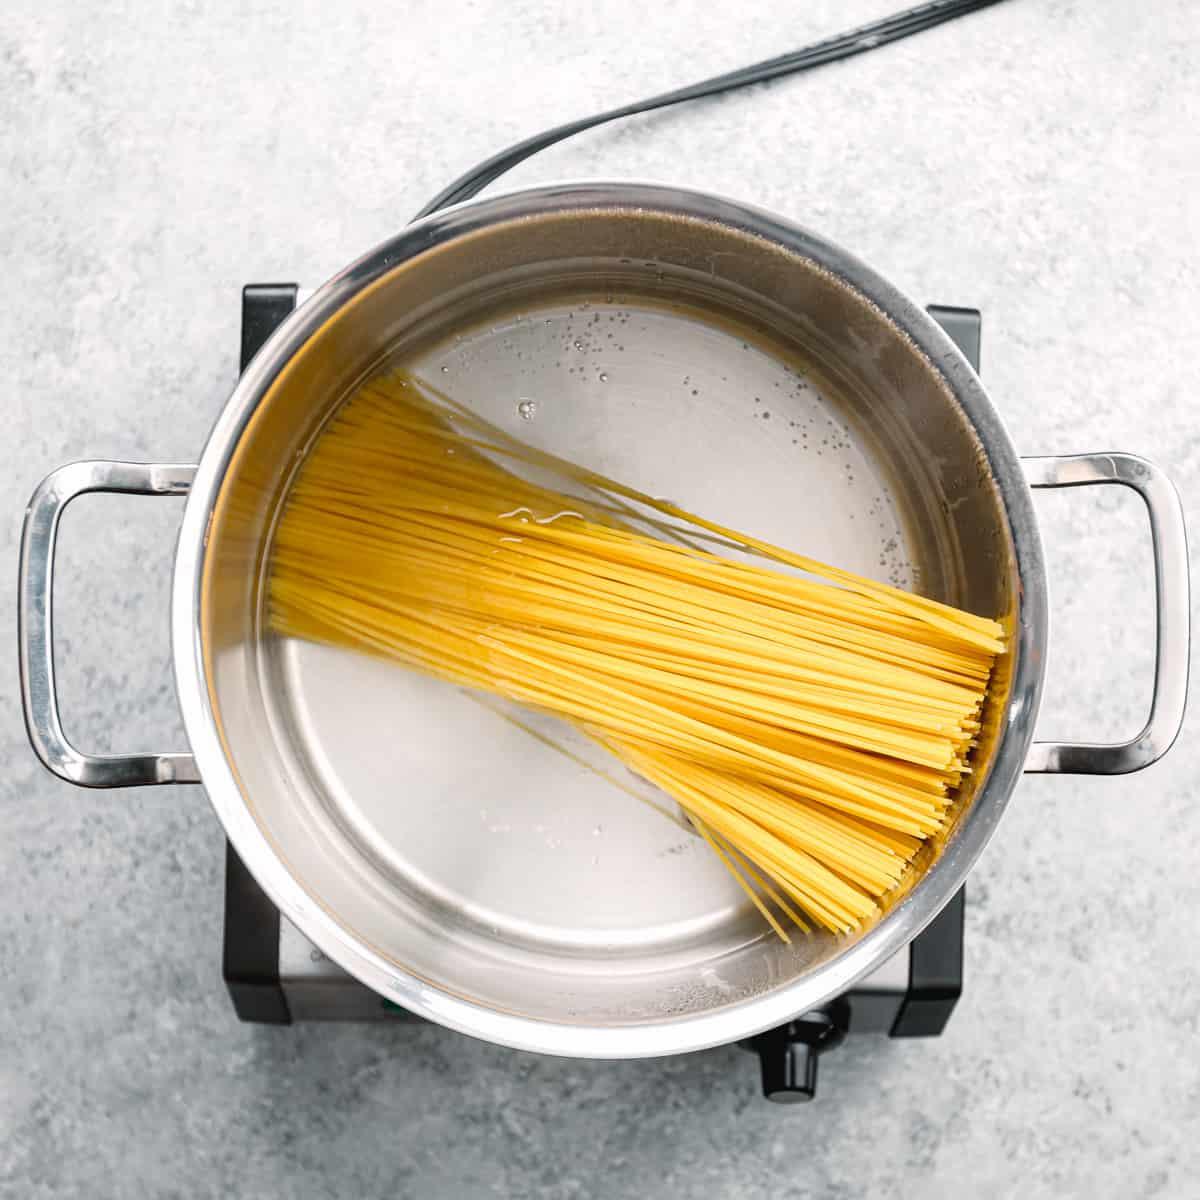 cooking pasta.